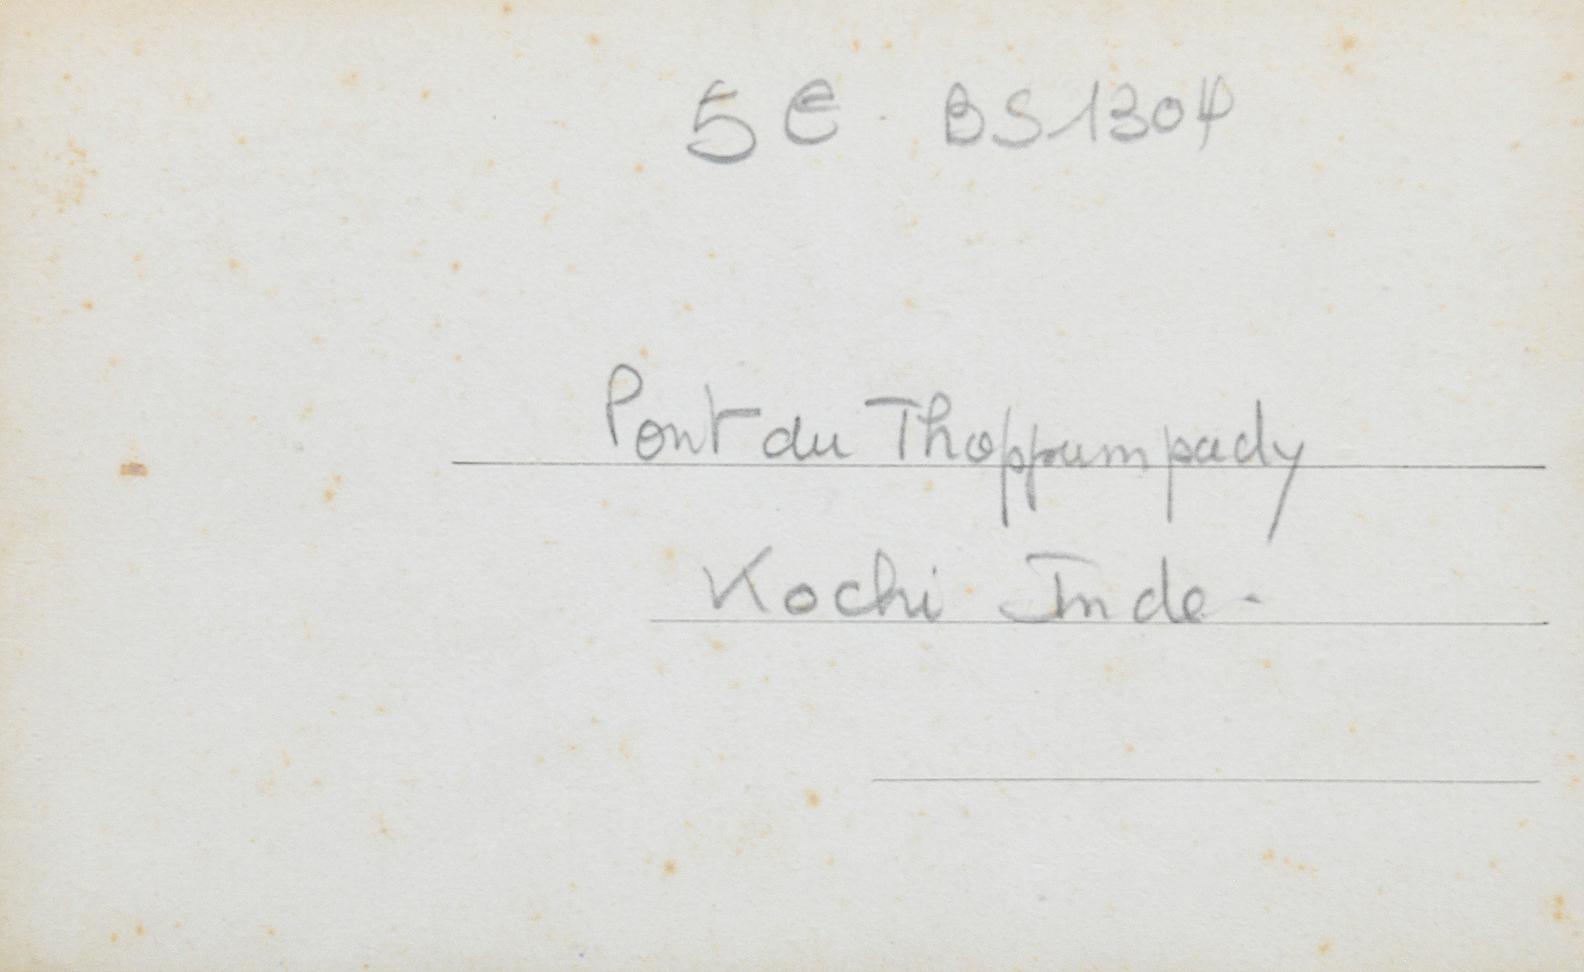 Mattancherry & Venduruthy Bridges Kochi - 2 Old Postcards